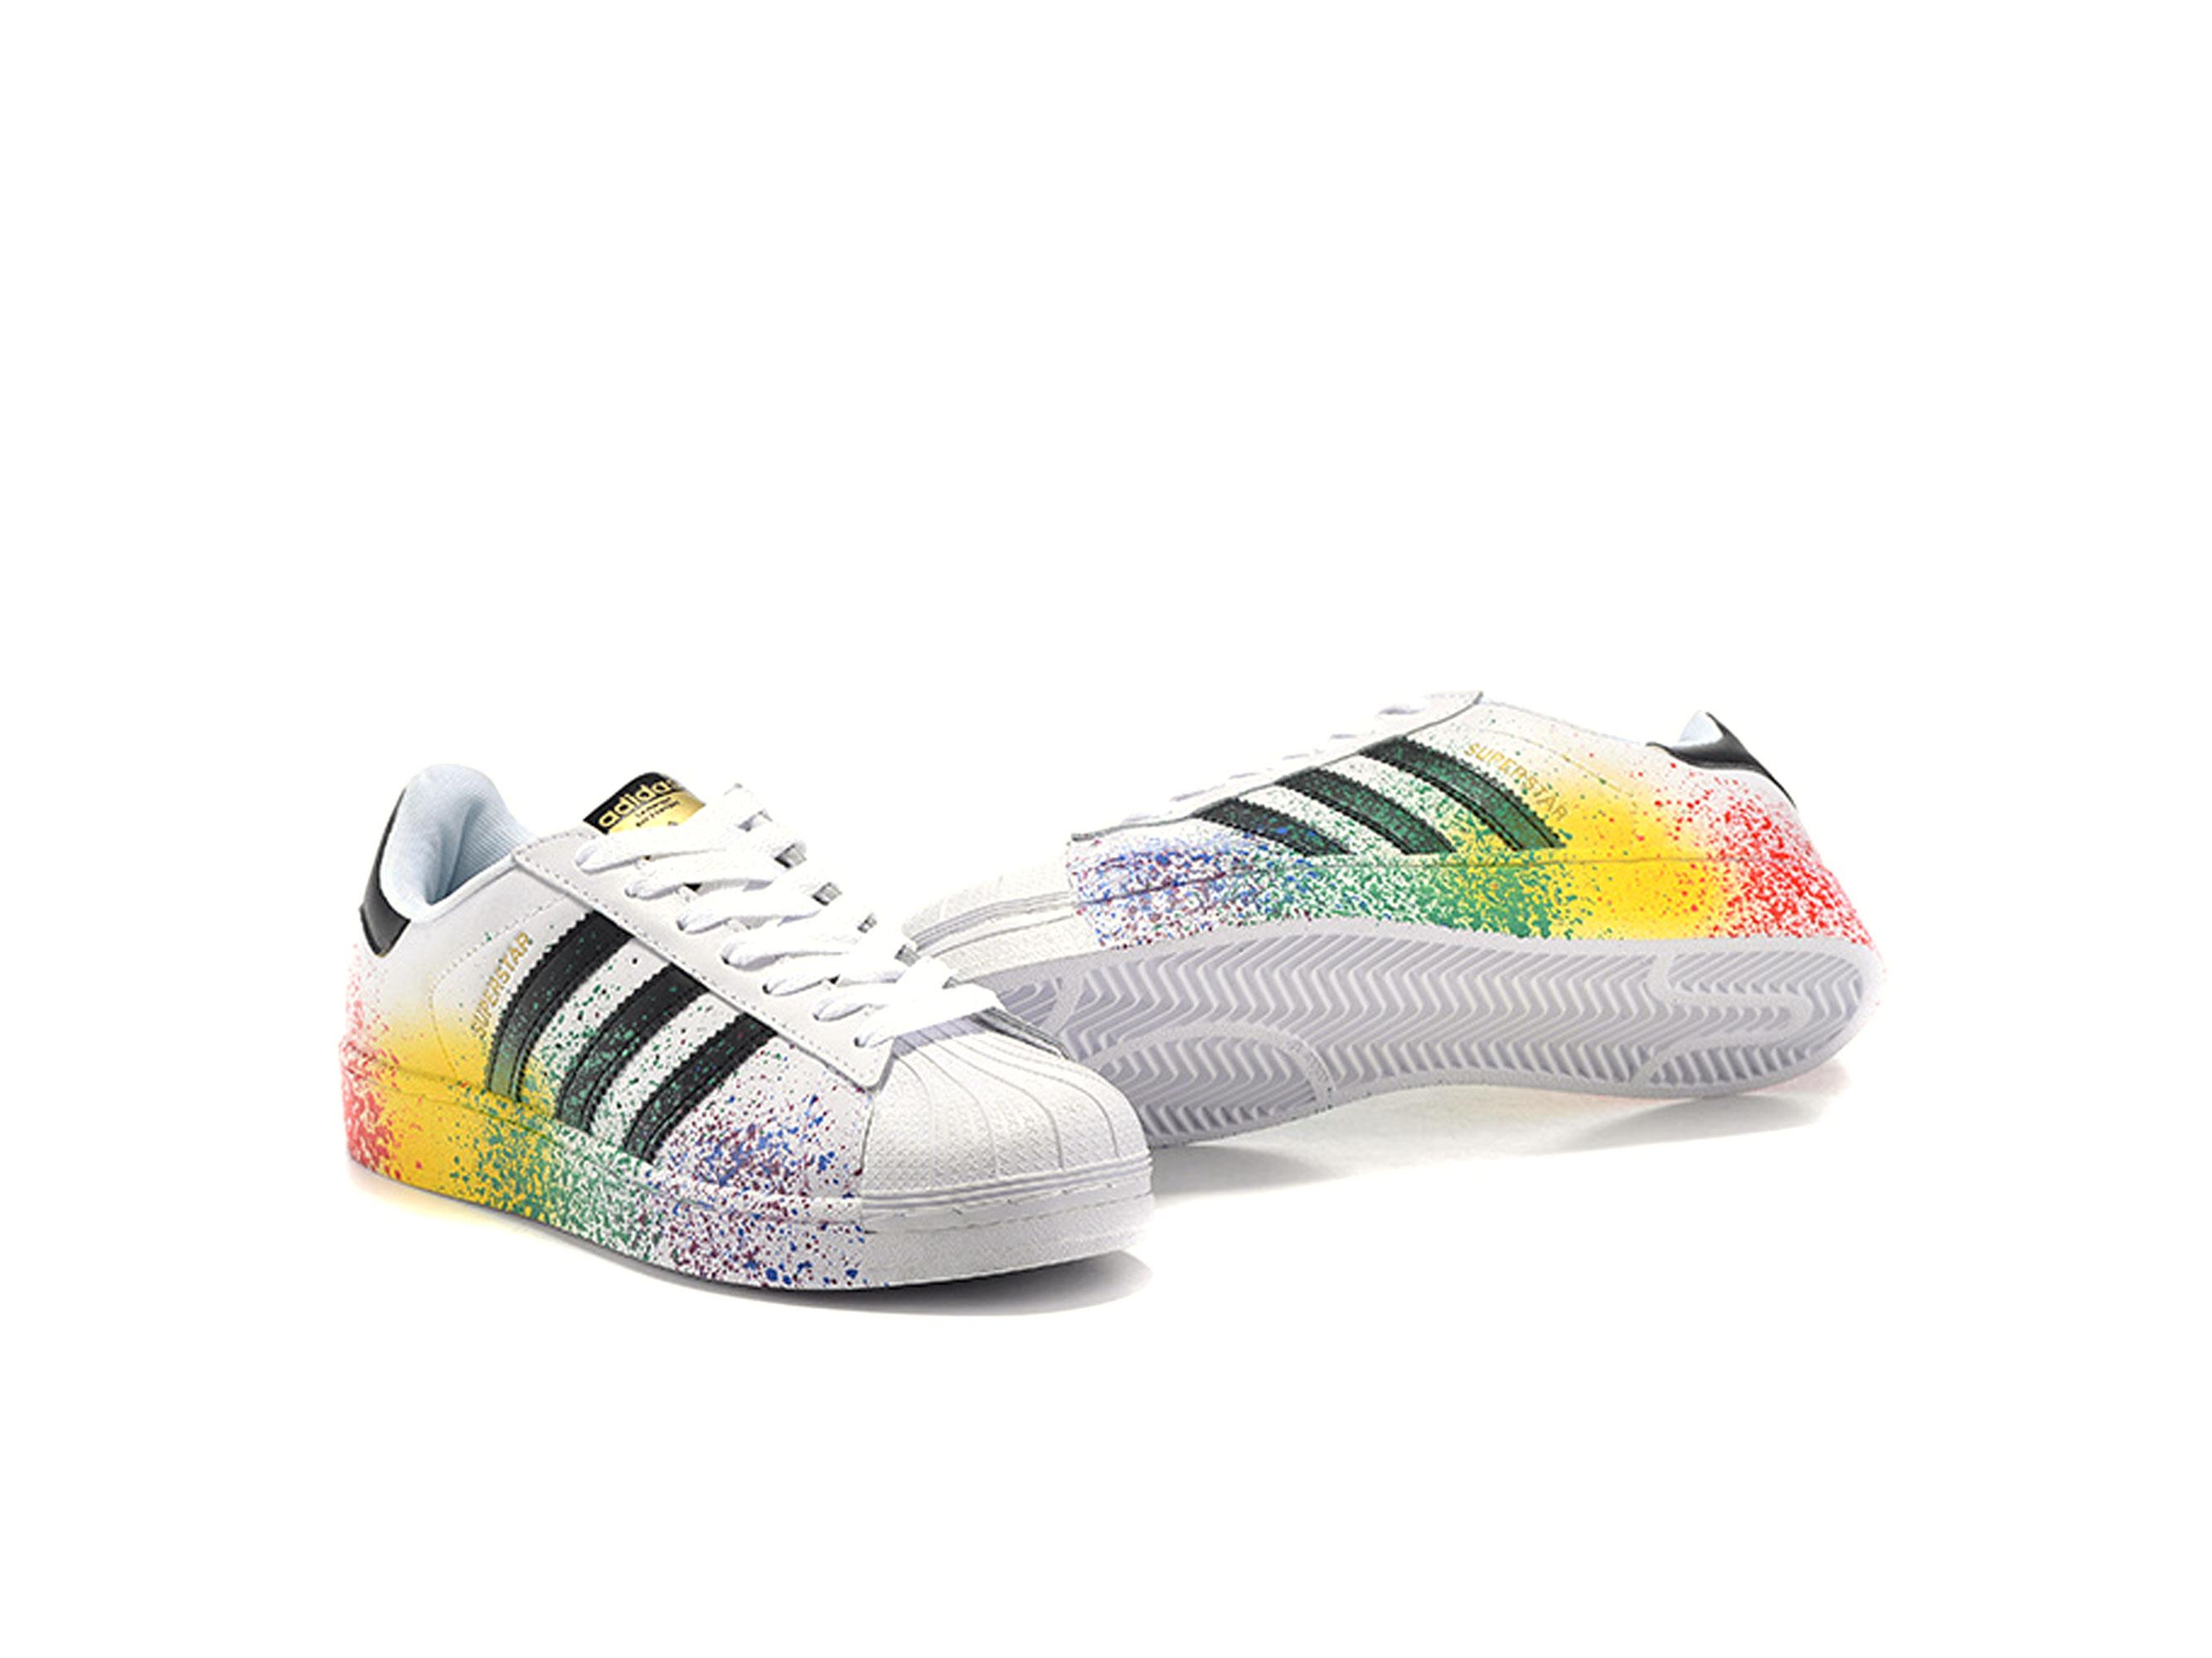 reputable site 4148e 0048b adidas superstar pride pack white